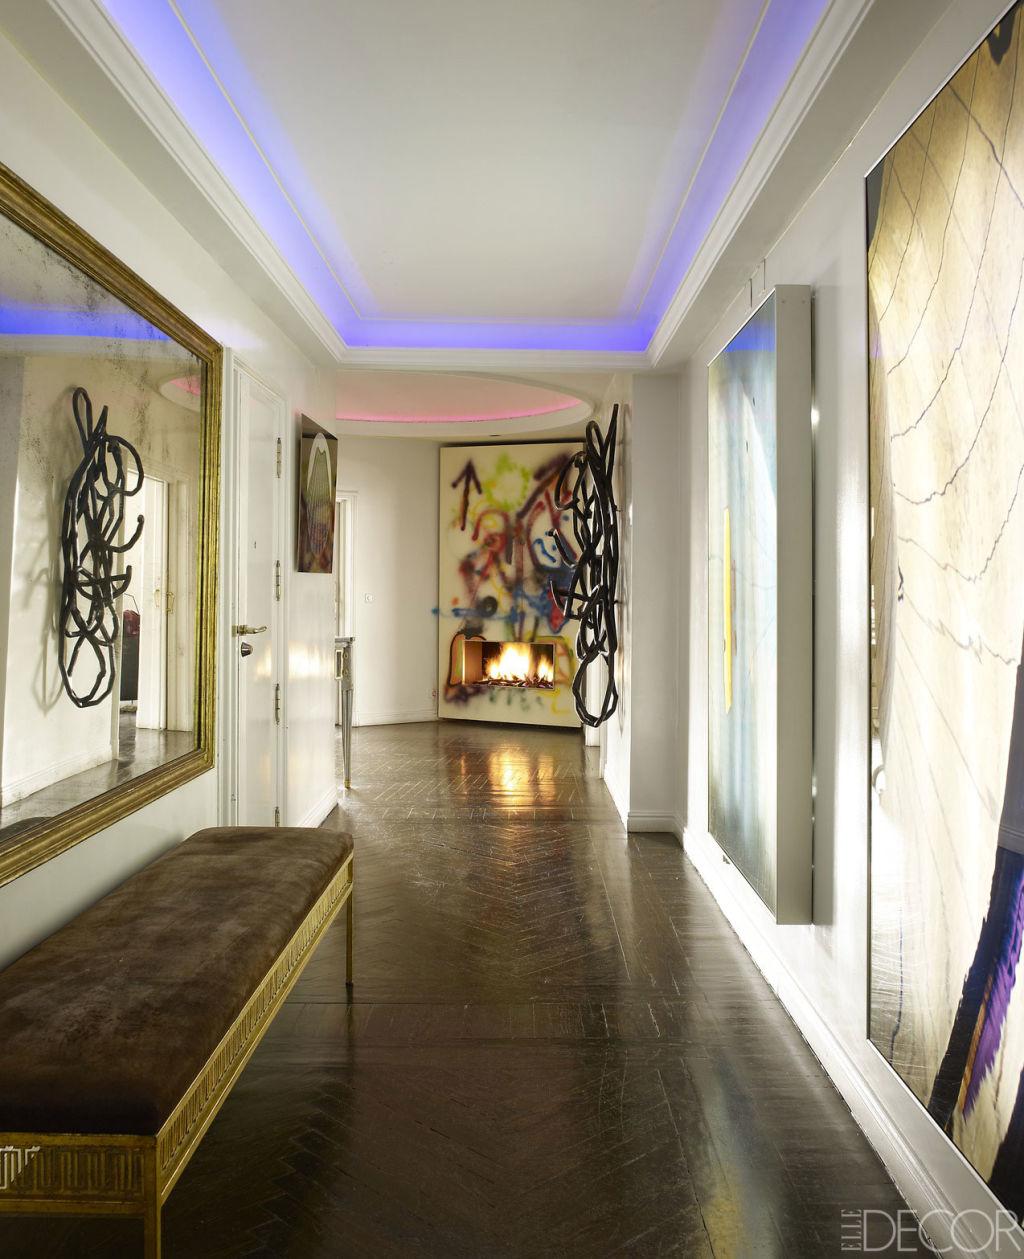 New Home Design Ideas Theme Inspiration 10 Hallway: Manolo March Madrid Apartment